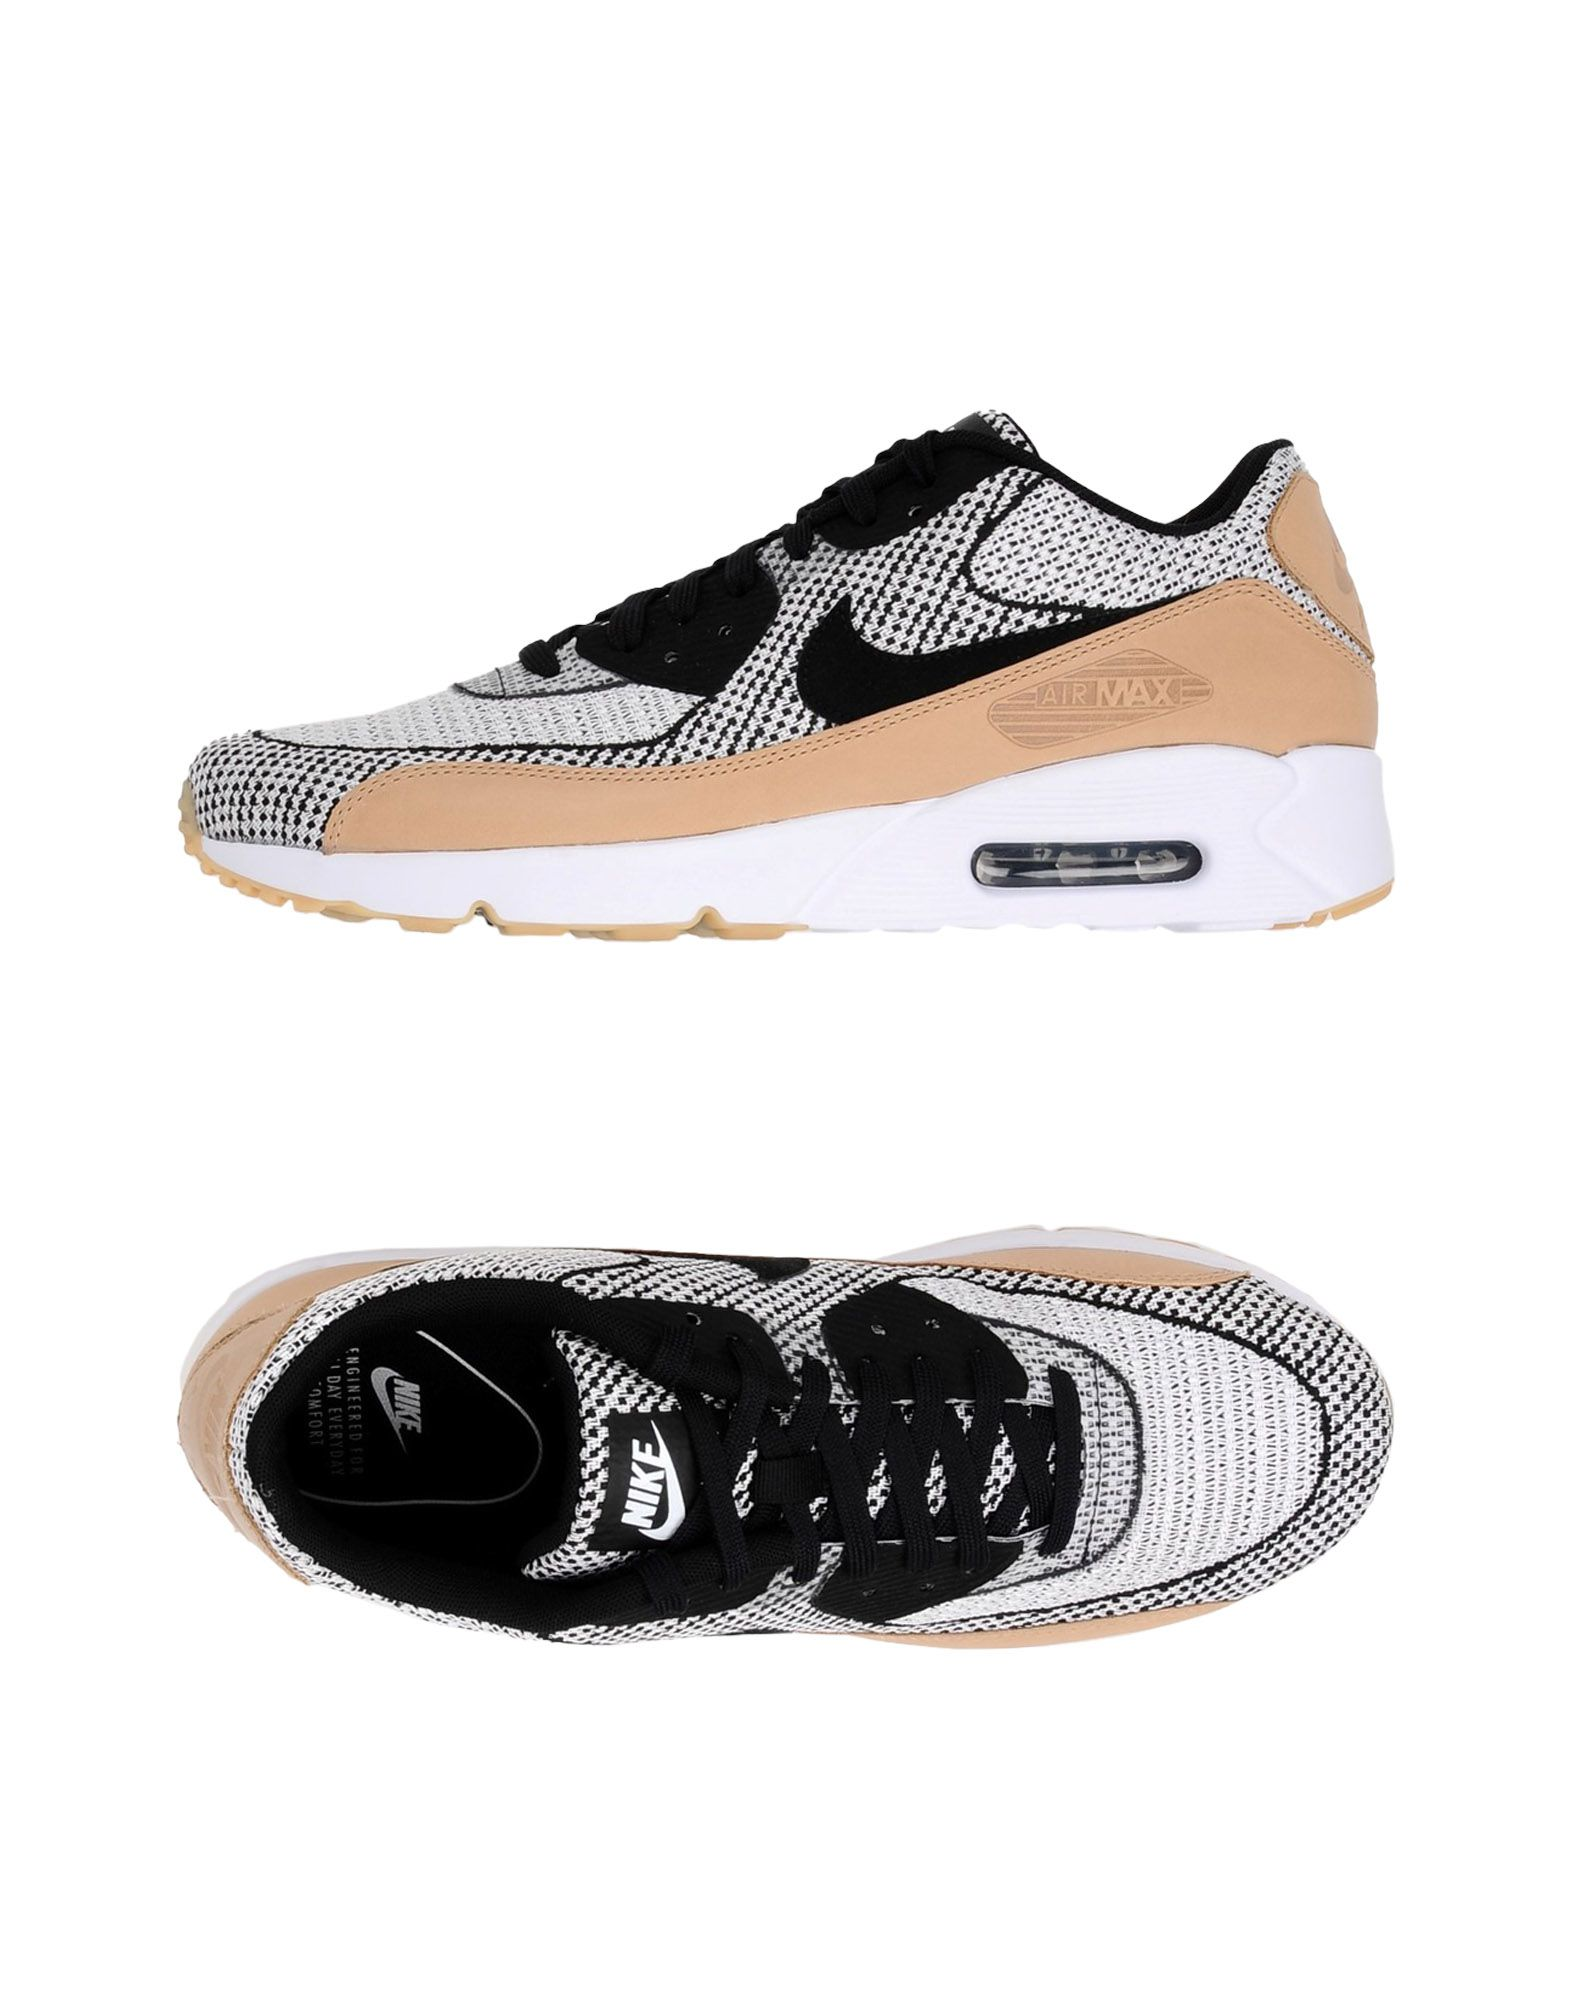 Sneakers Nike Air Max 90 Ultra 2.0 Jackard Breathe - Uomo - Acquista online su